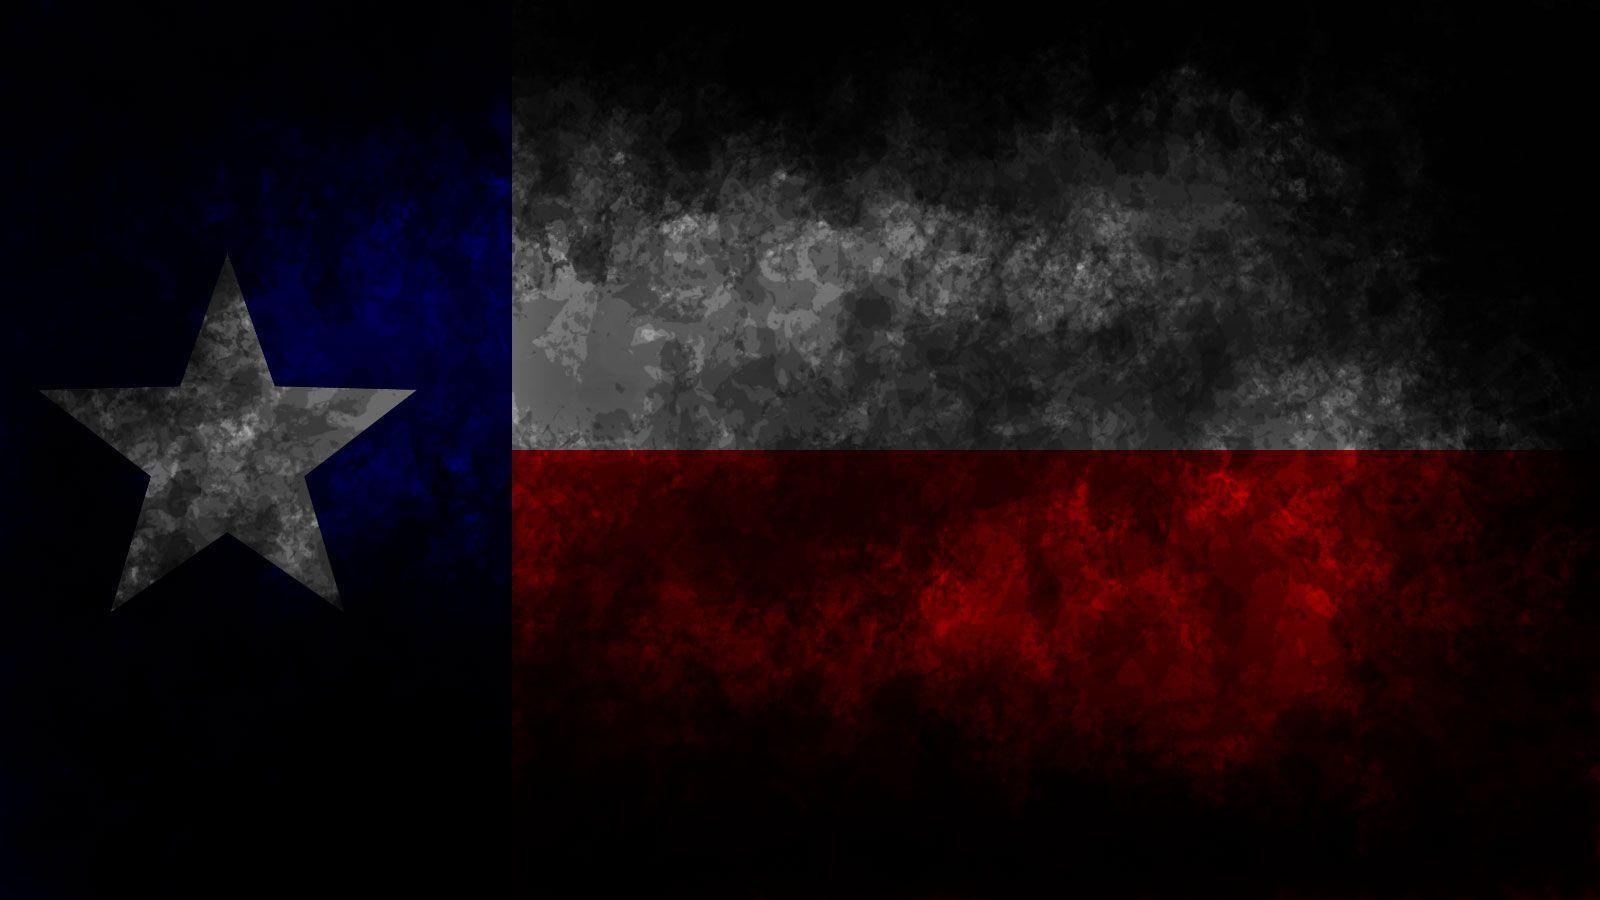 texas flag wallpaper, texas flag backgrounds